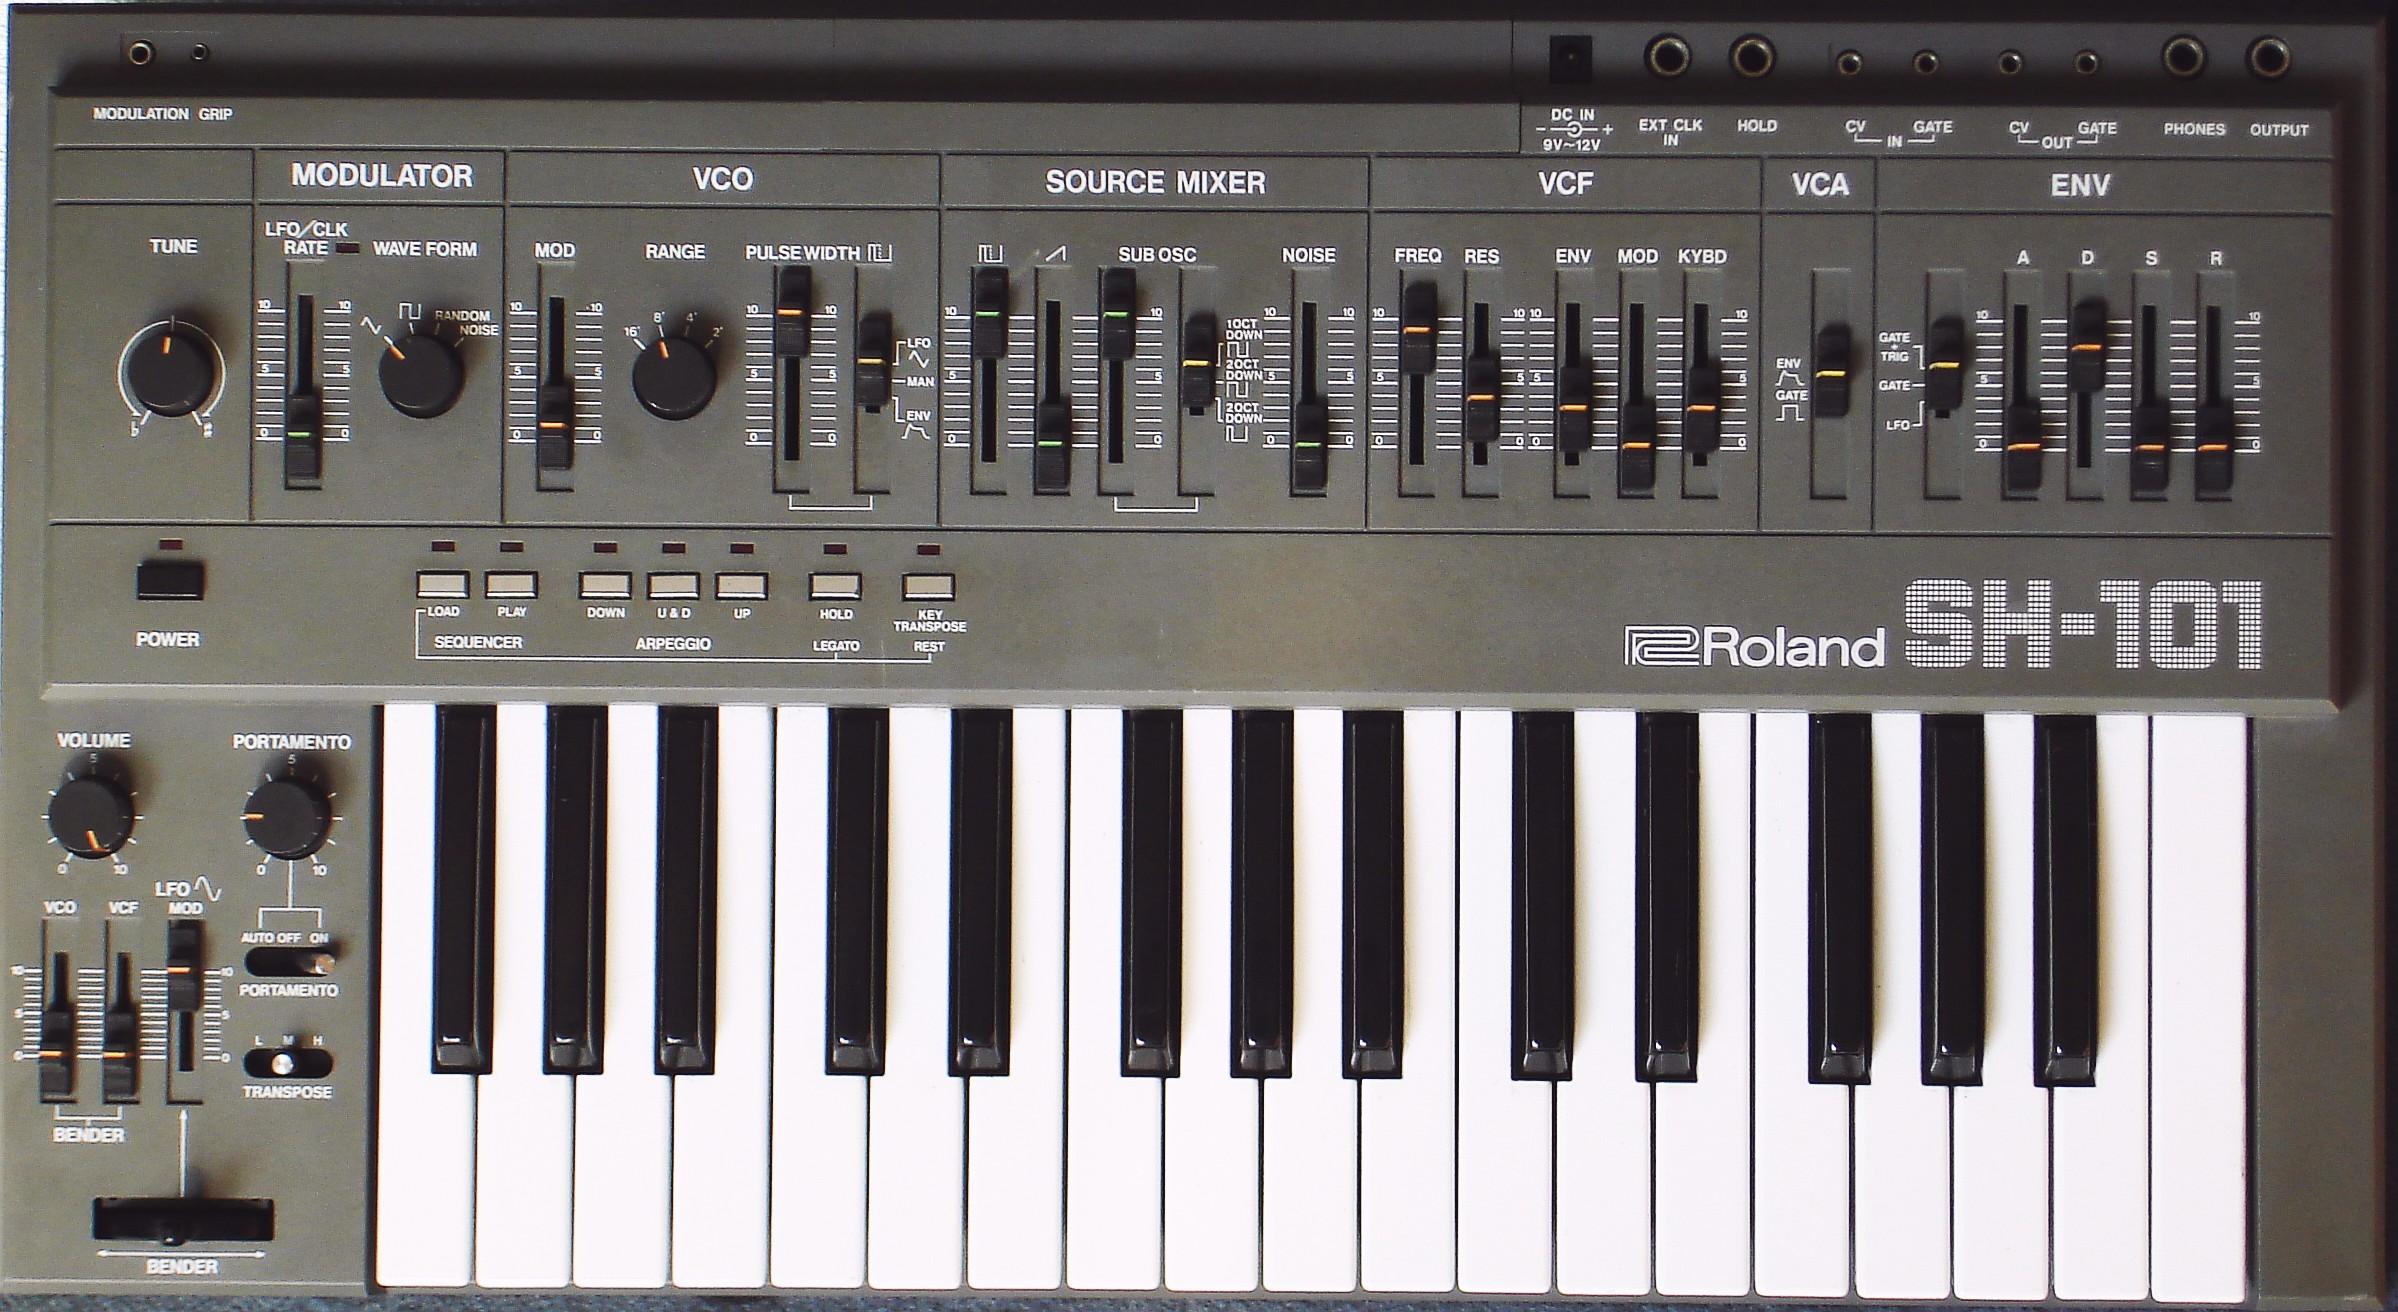 Roland SH-101 monosynth